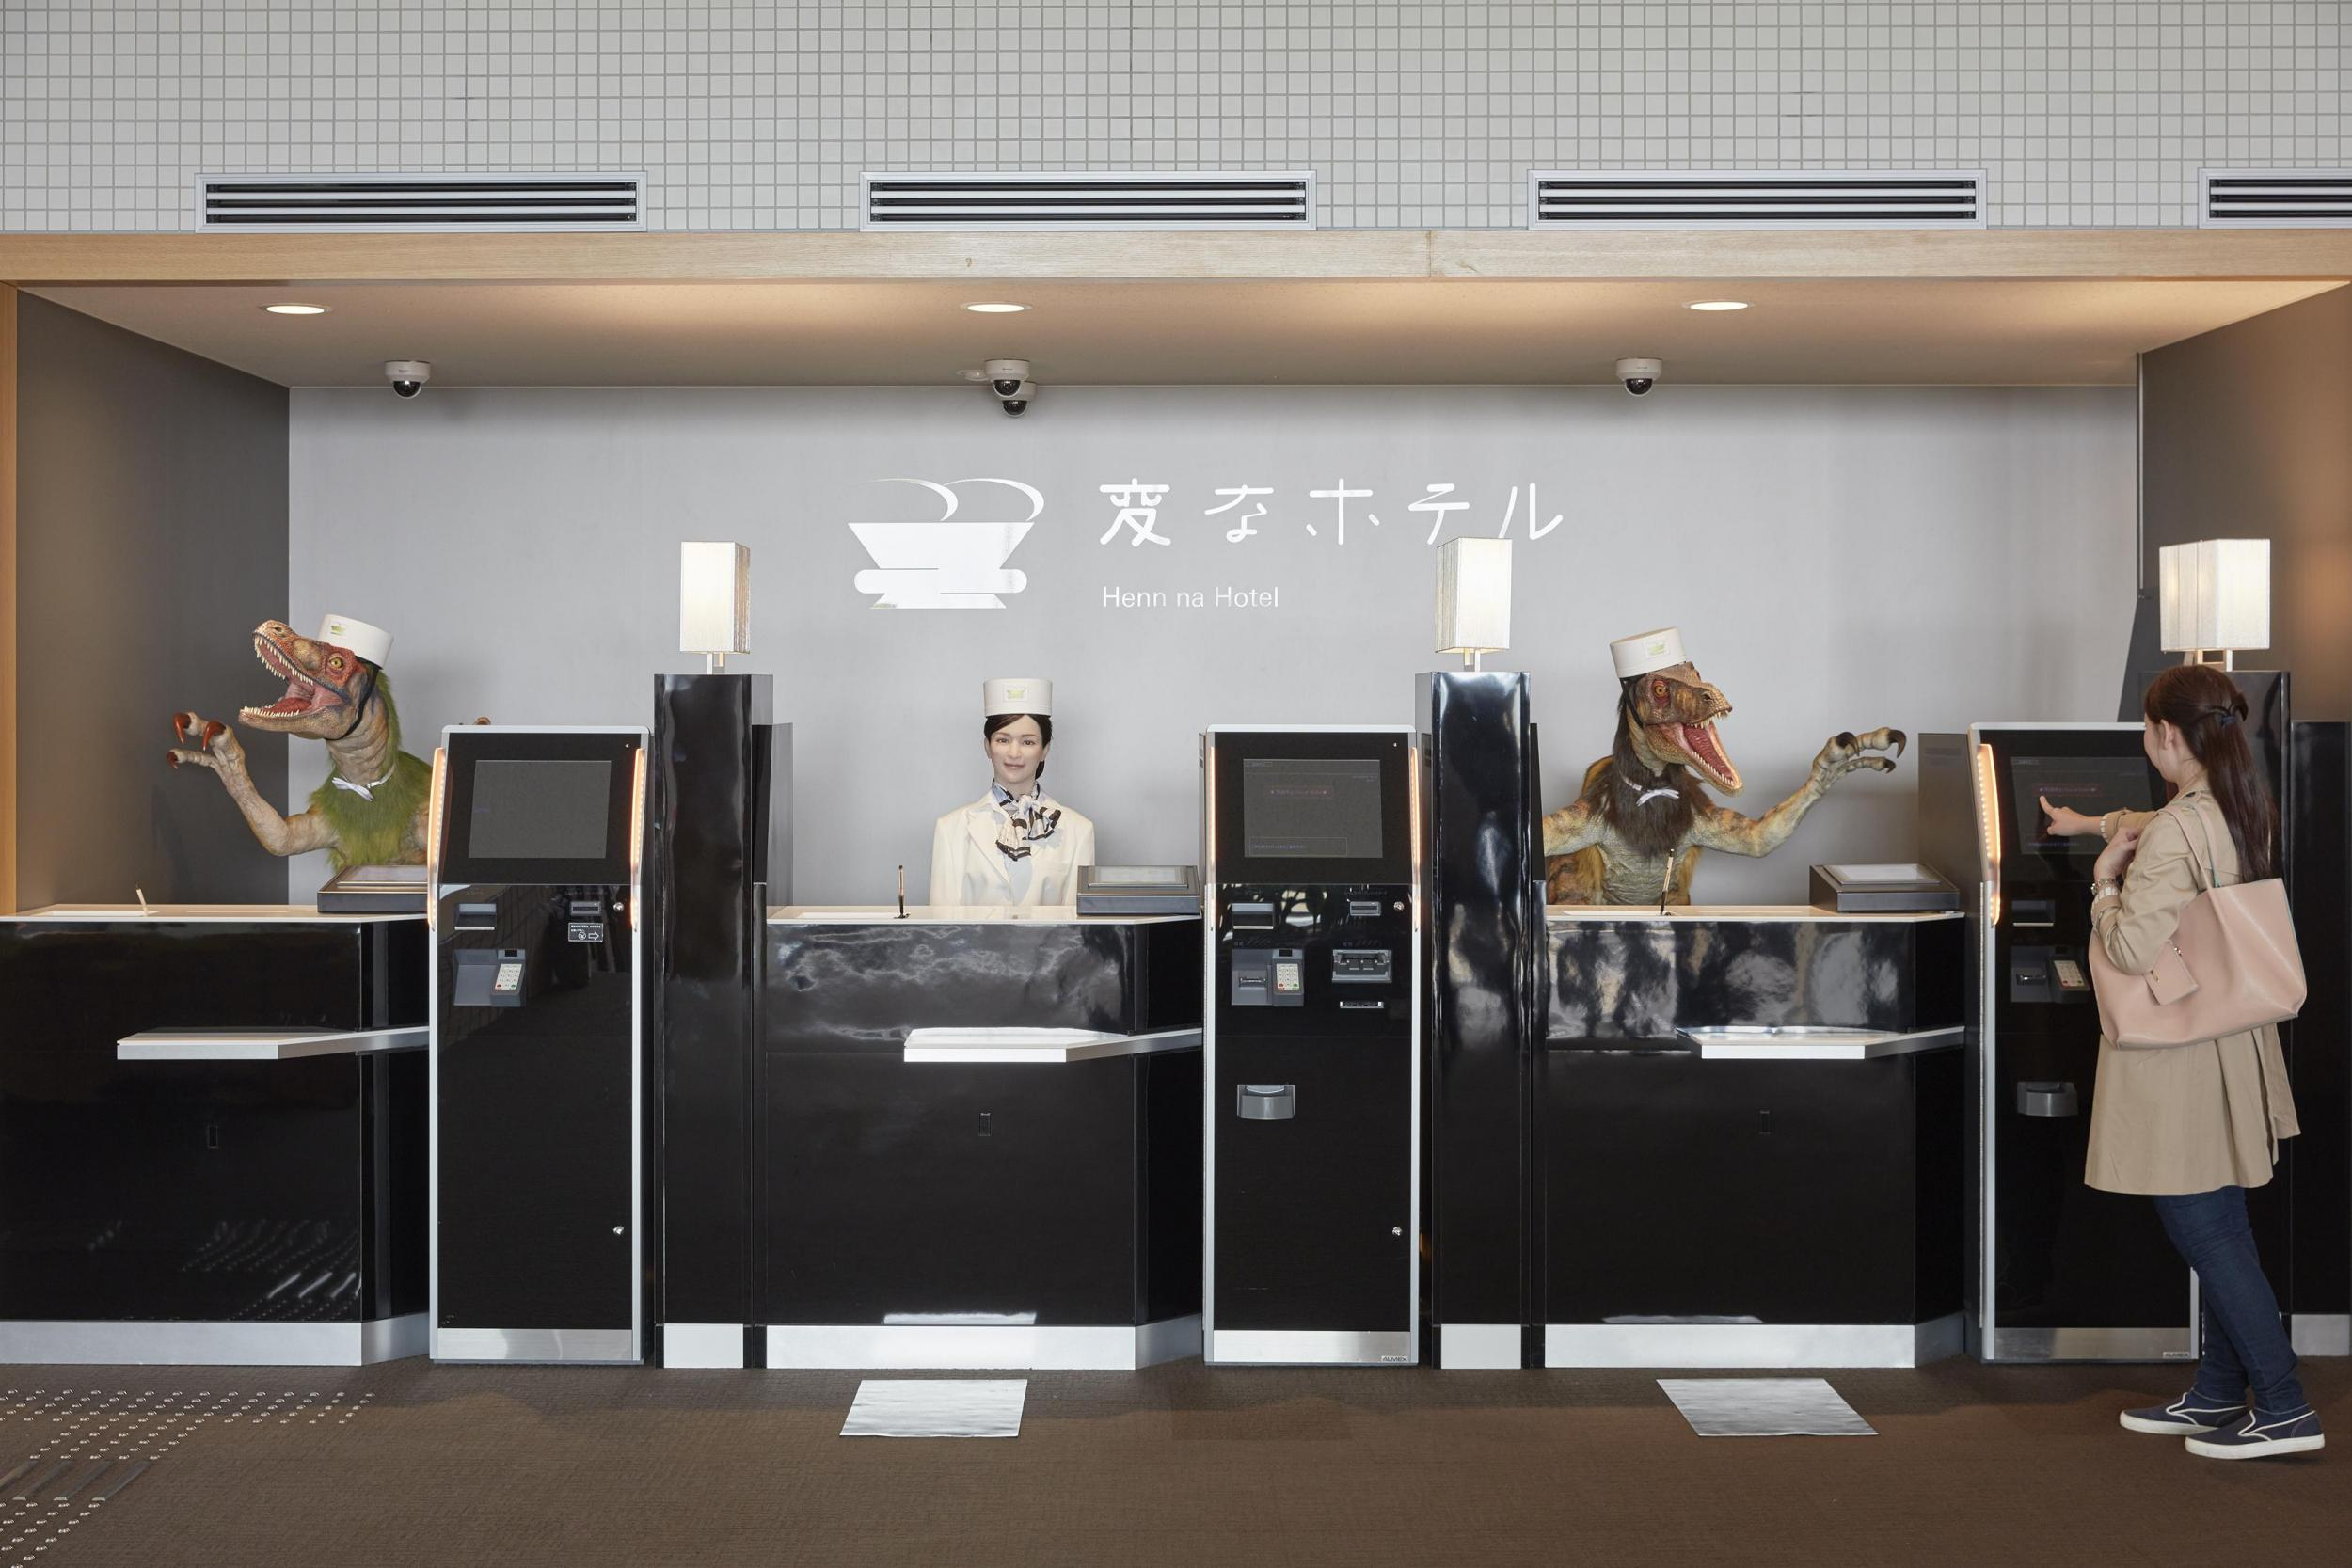 henn-na-hotel-3-robot-receptionists